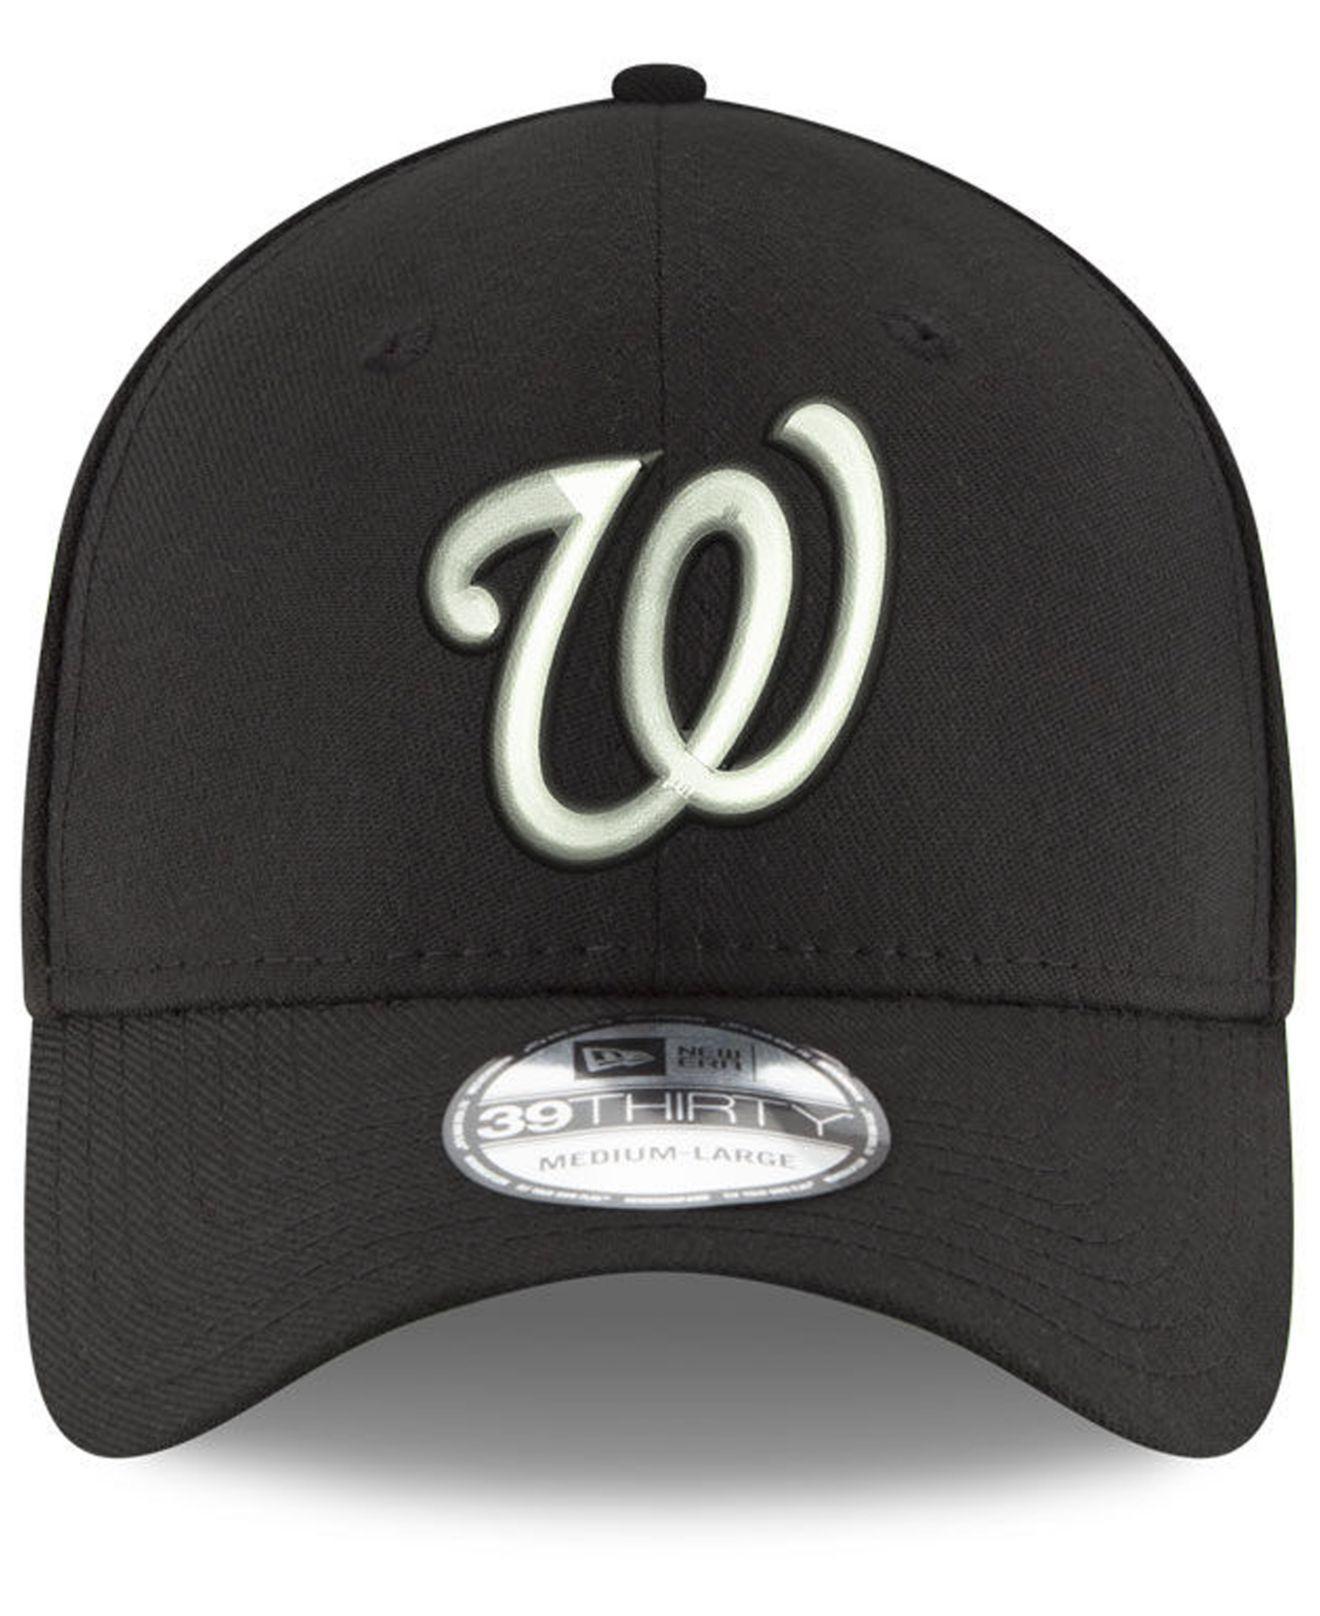 size 40 3ccb2 13229 ... usa lyst ktz washington nationals dub classic 39thirty cap in black for  men 0dad6 ed2fb